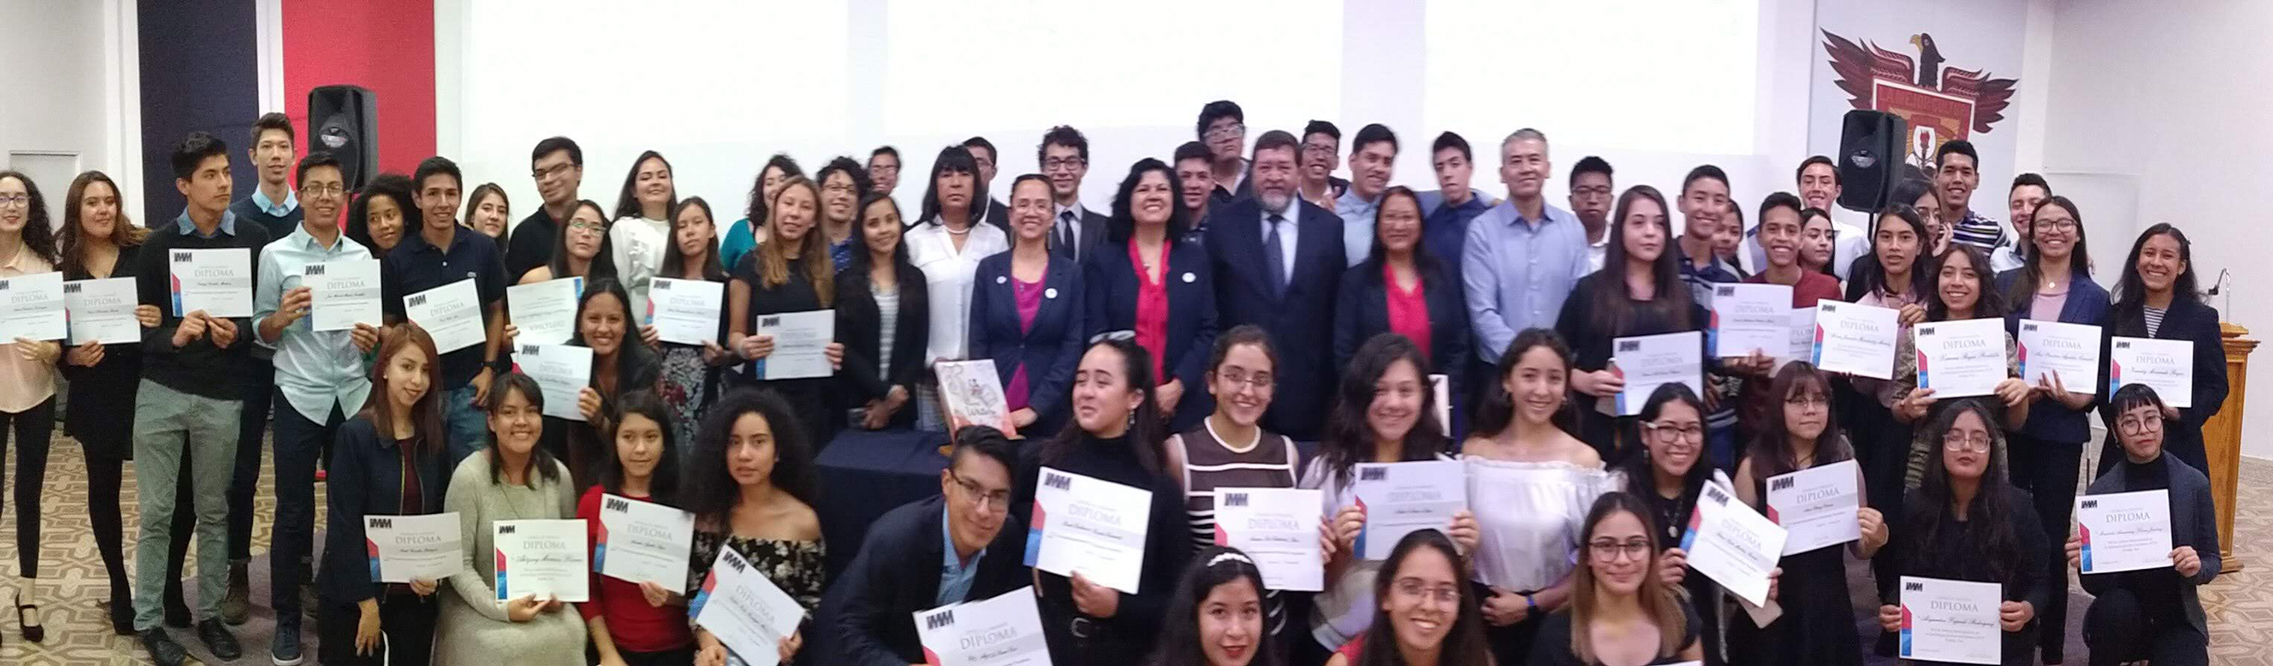 Jovenes-Escritores-IMM-Centro-2